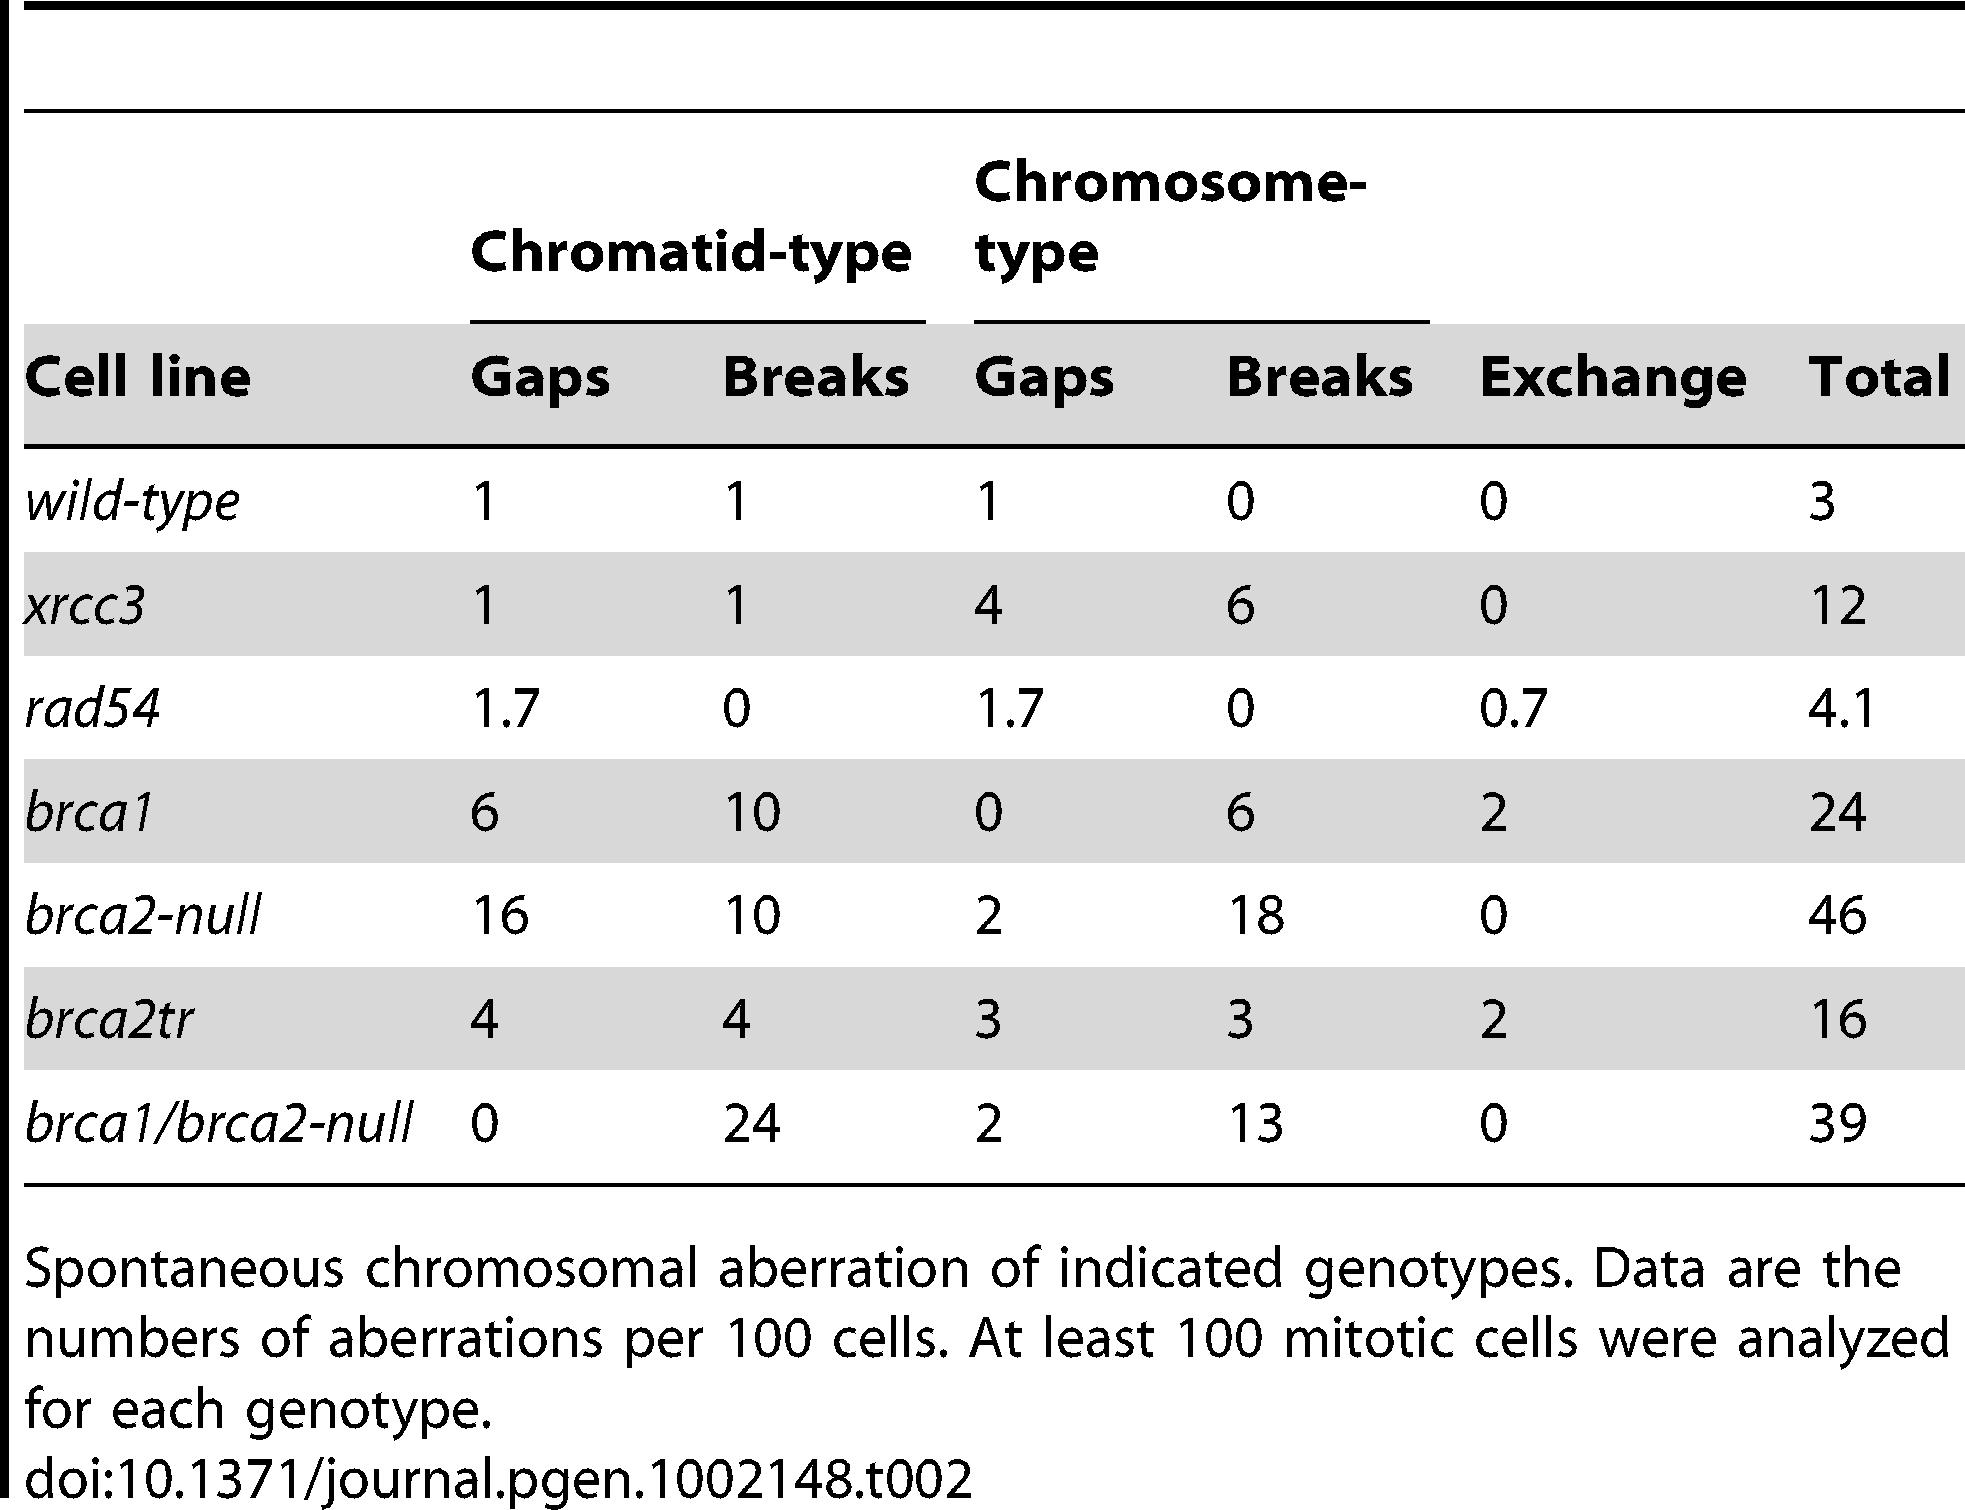 Spontaneous chromosomal aberrations.